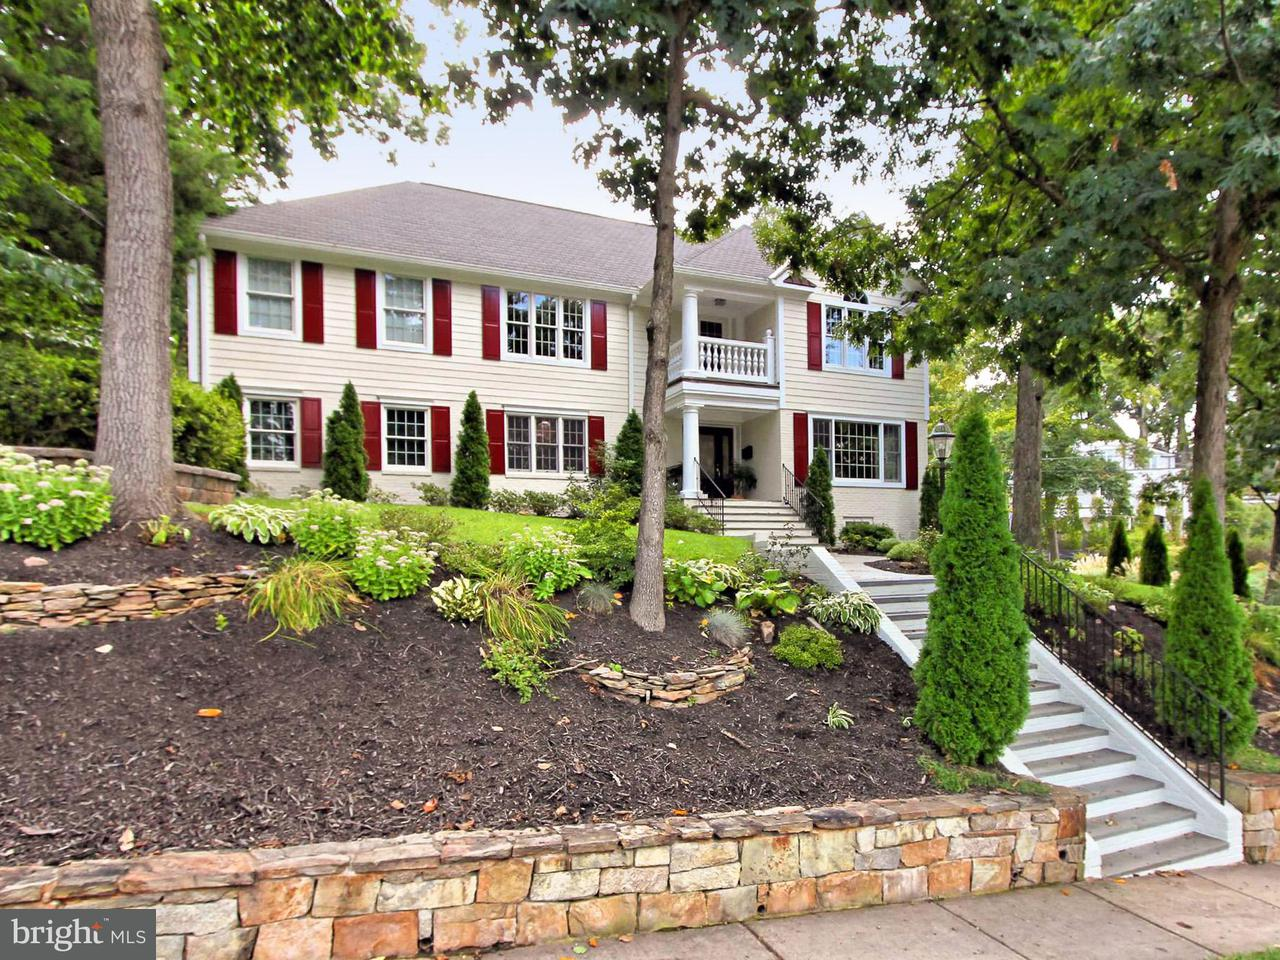 Single Family Home for Sale at 3401 VENICE ST N 3401 VENICE ST N Arlington, Virginia 22207 United States